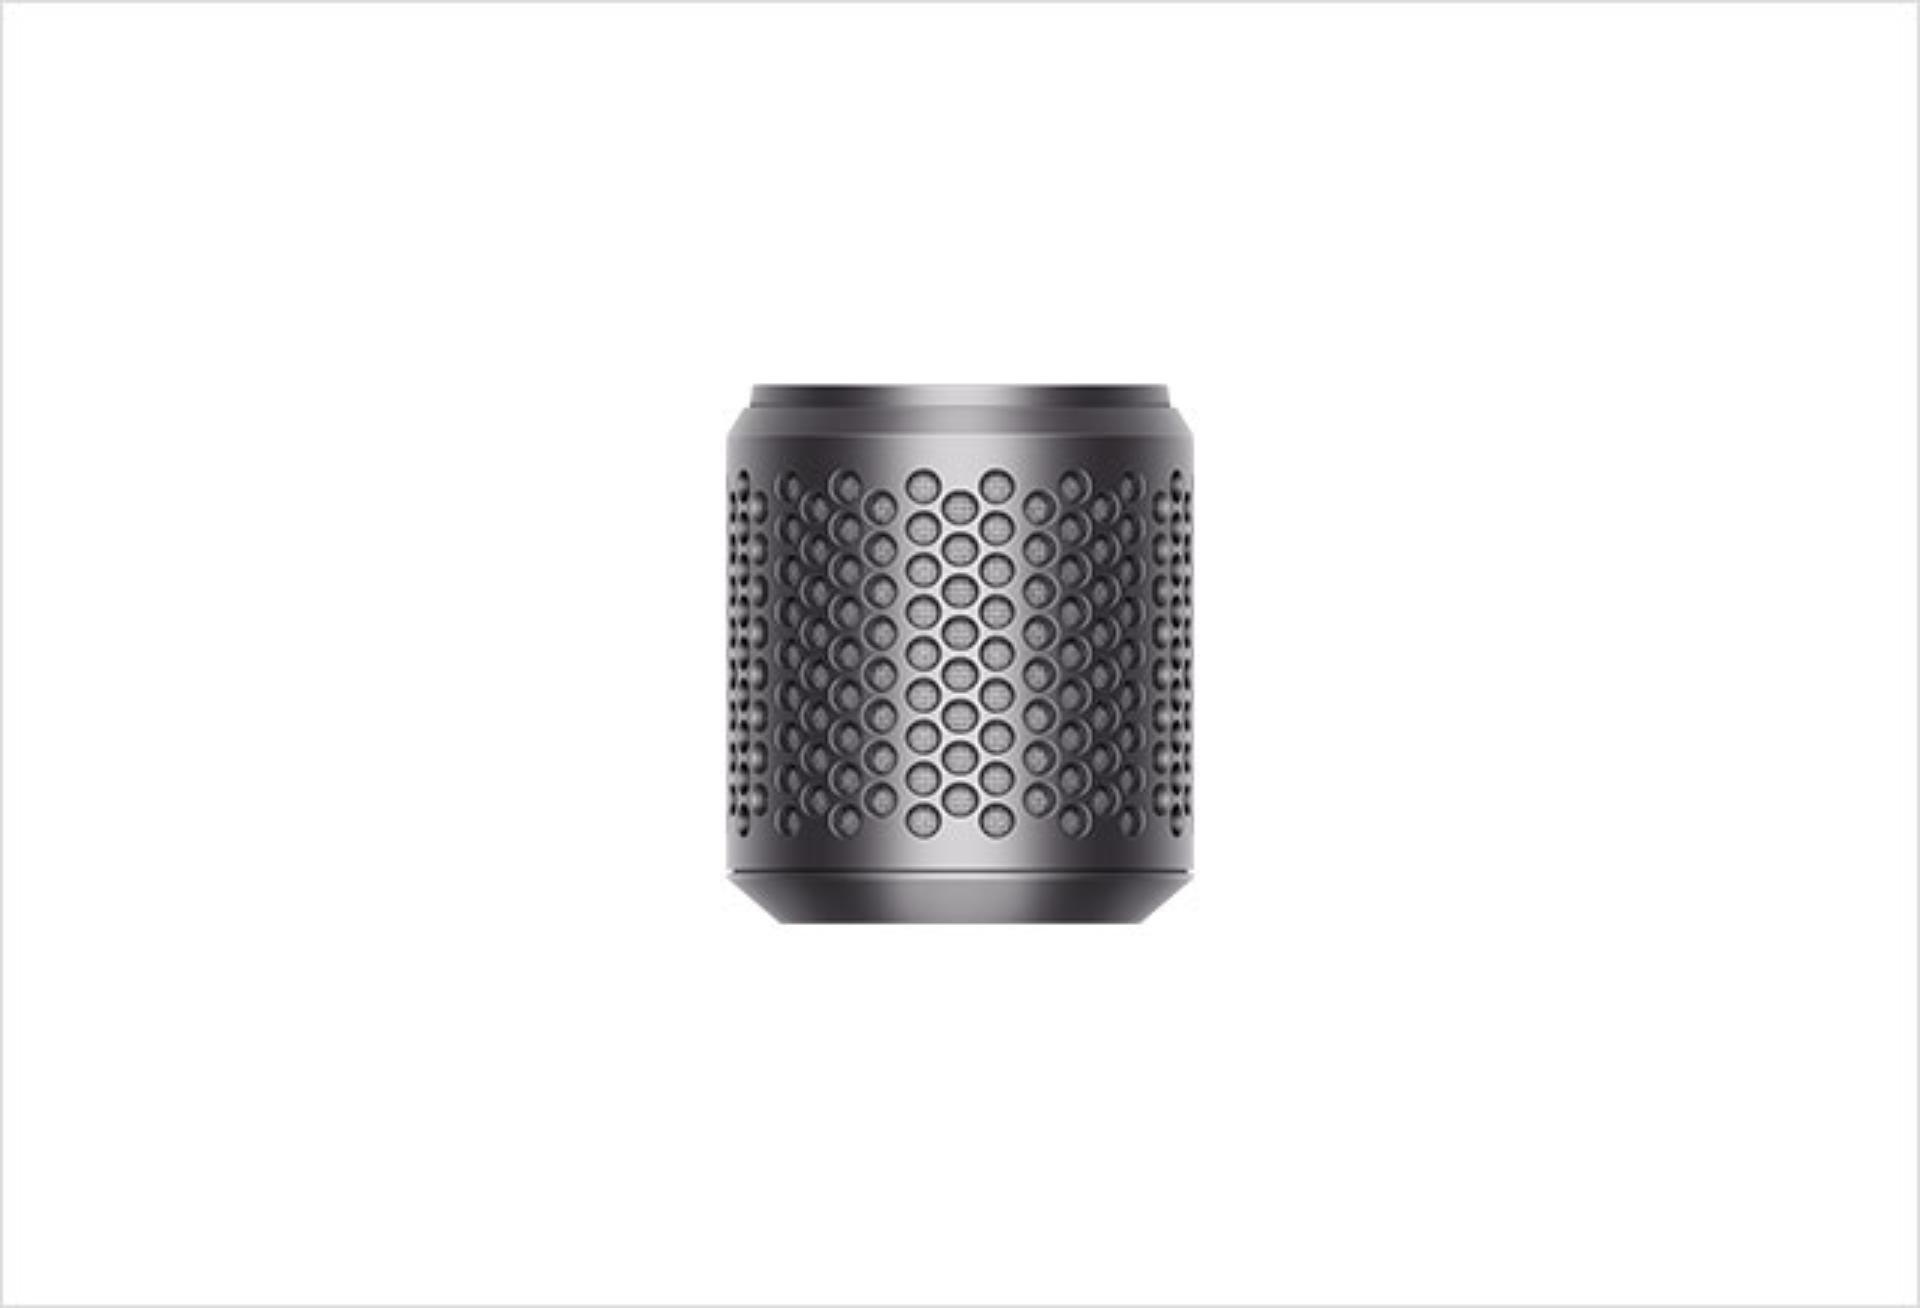 Yedek filtre kafesi